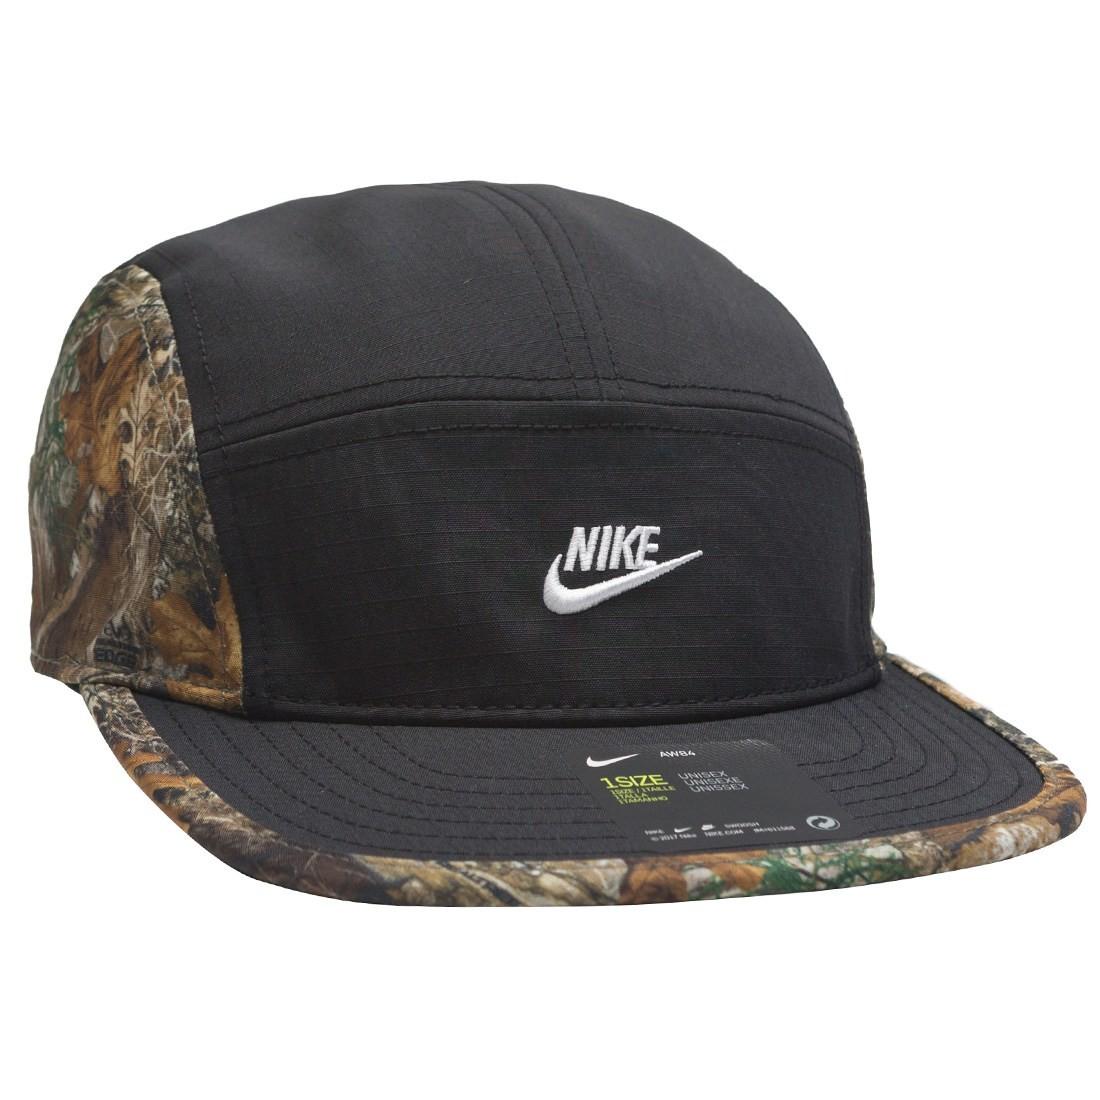 2393faa75c6 nike men nrg sportswear aw84 rlt realtree adjustable cap black white